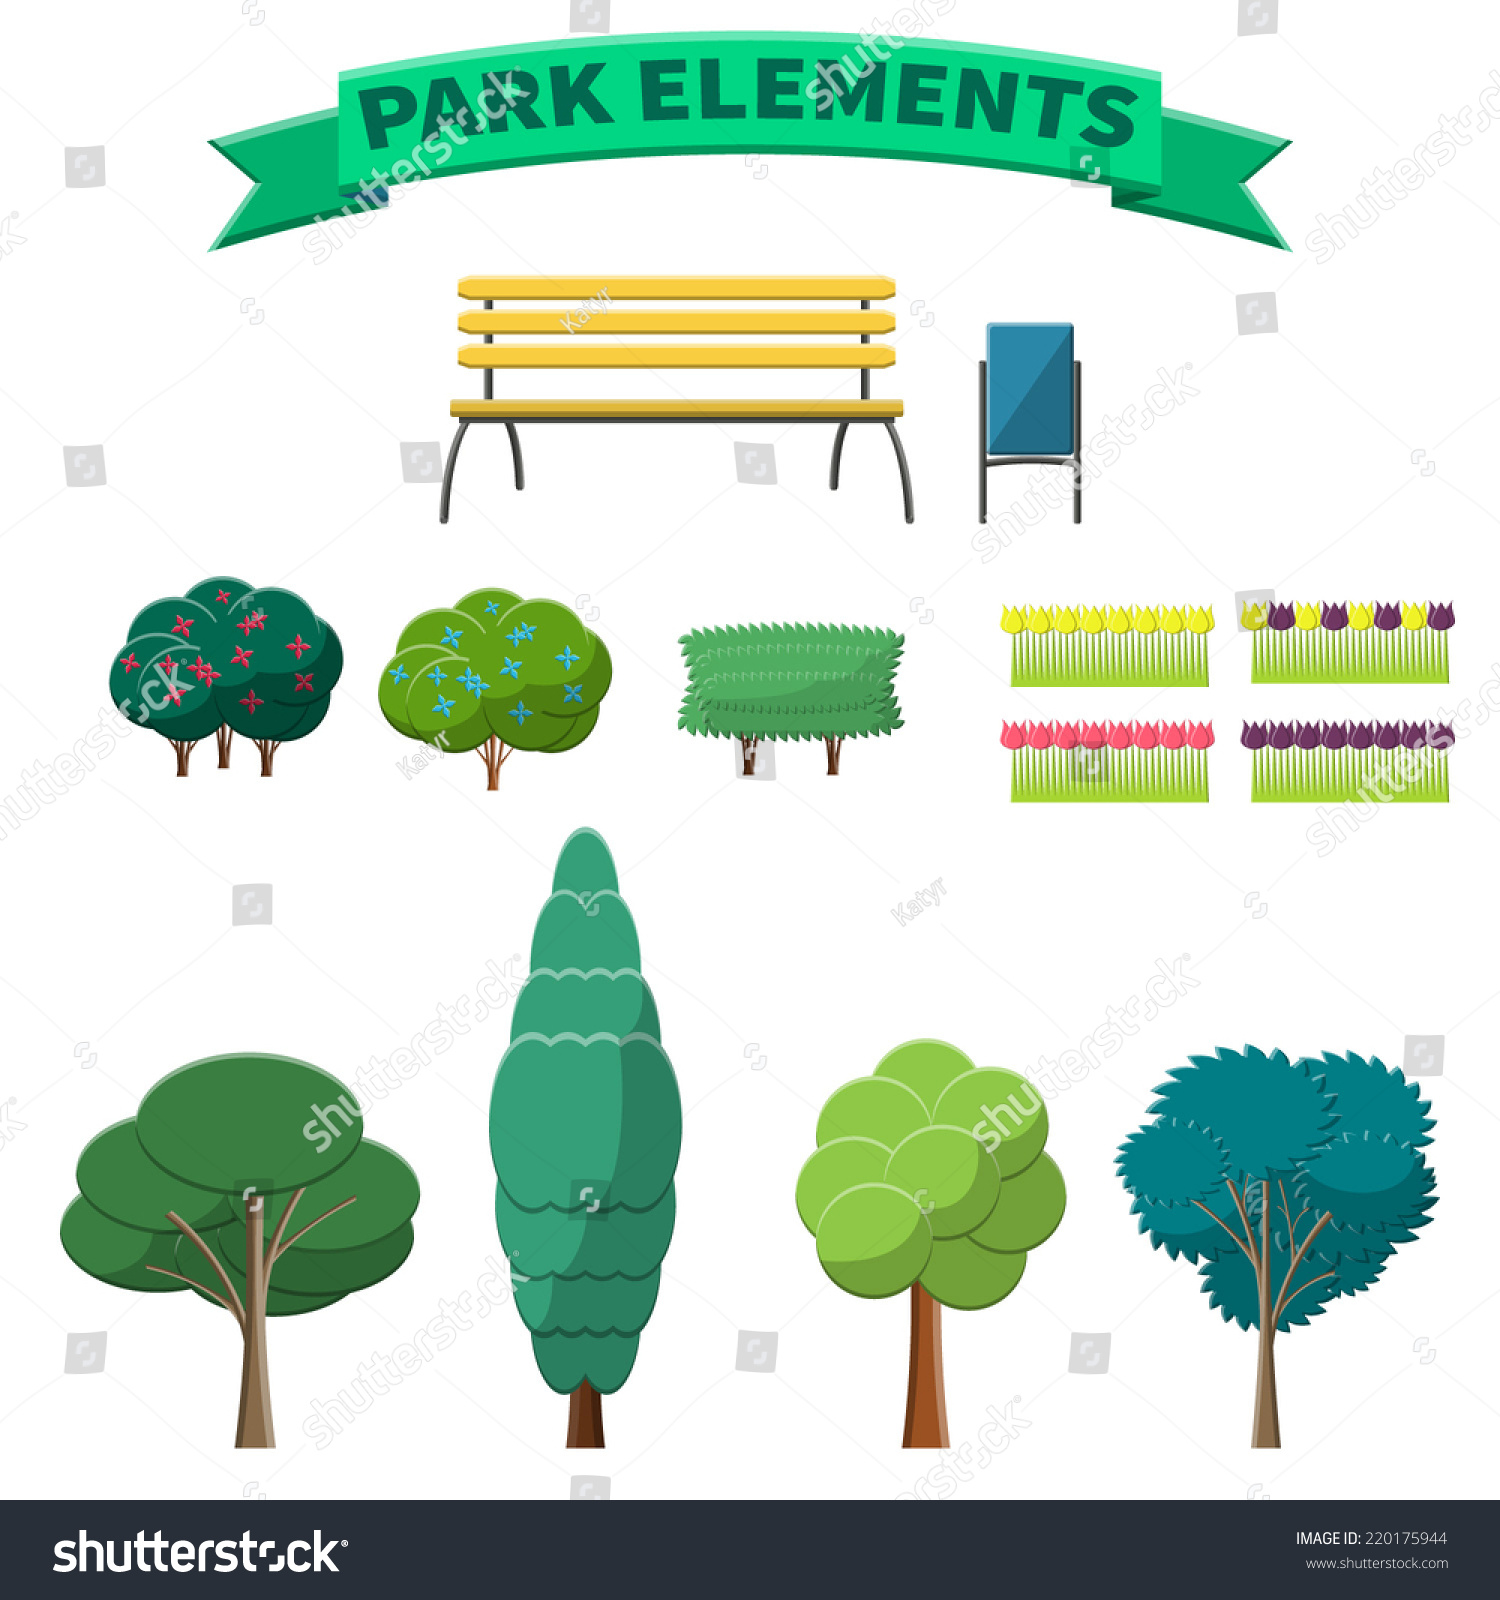 Garden Stock Image Image Of Design: Vector Illustration Park Elements Design Website Stock